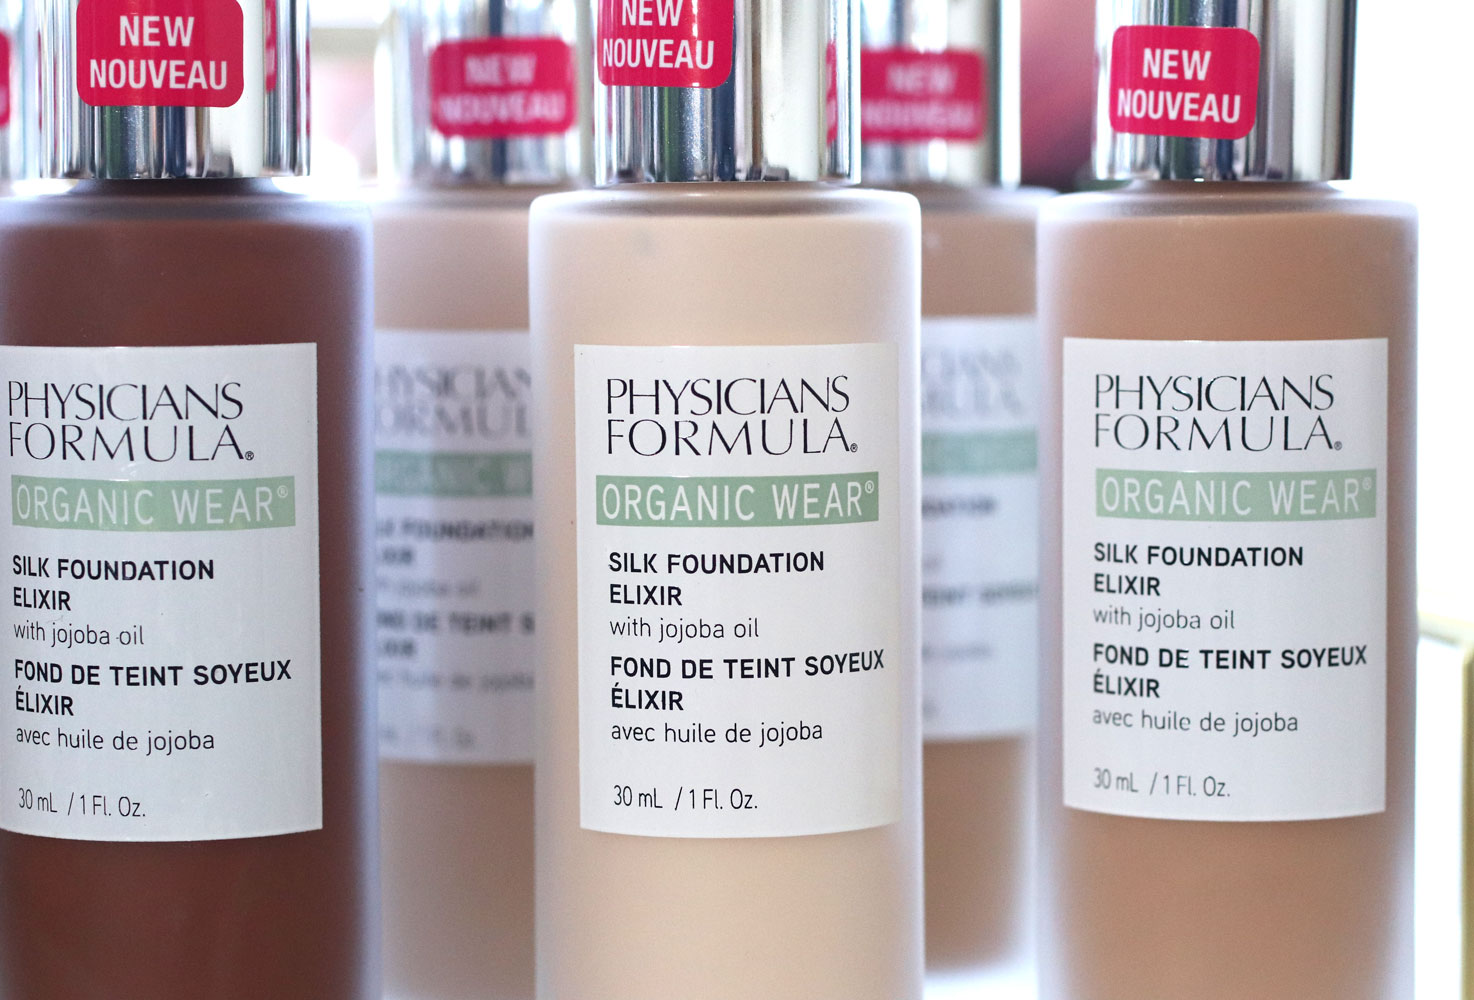 Physicians Formula Organic Wear Makeup 2019 Review